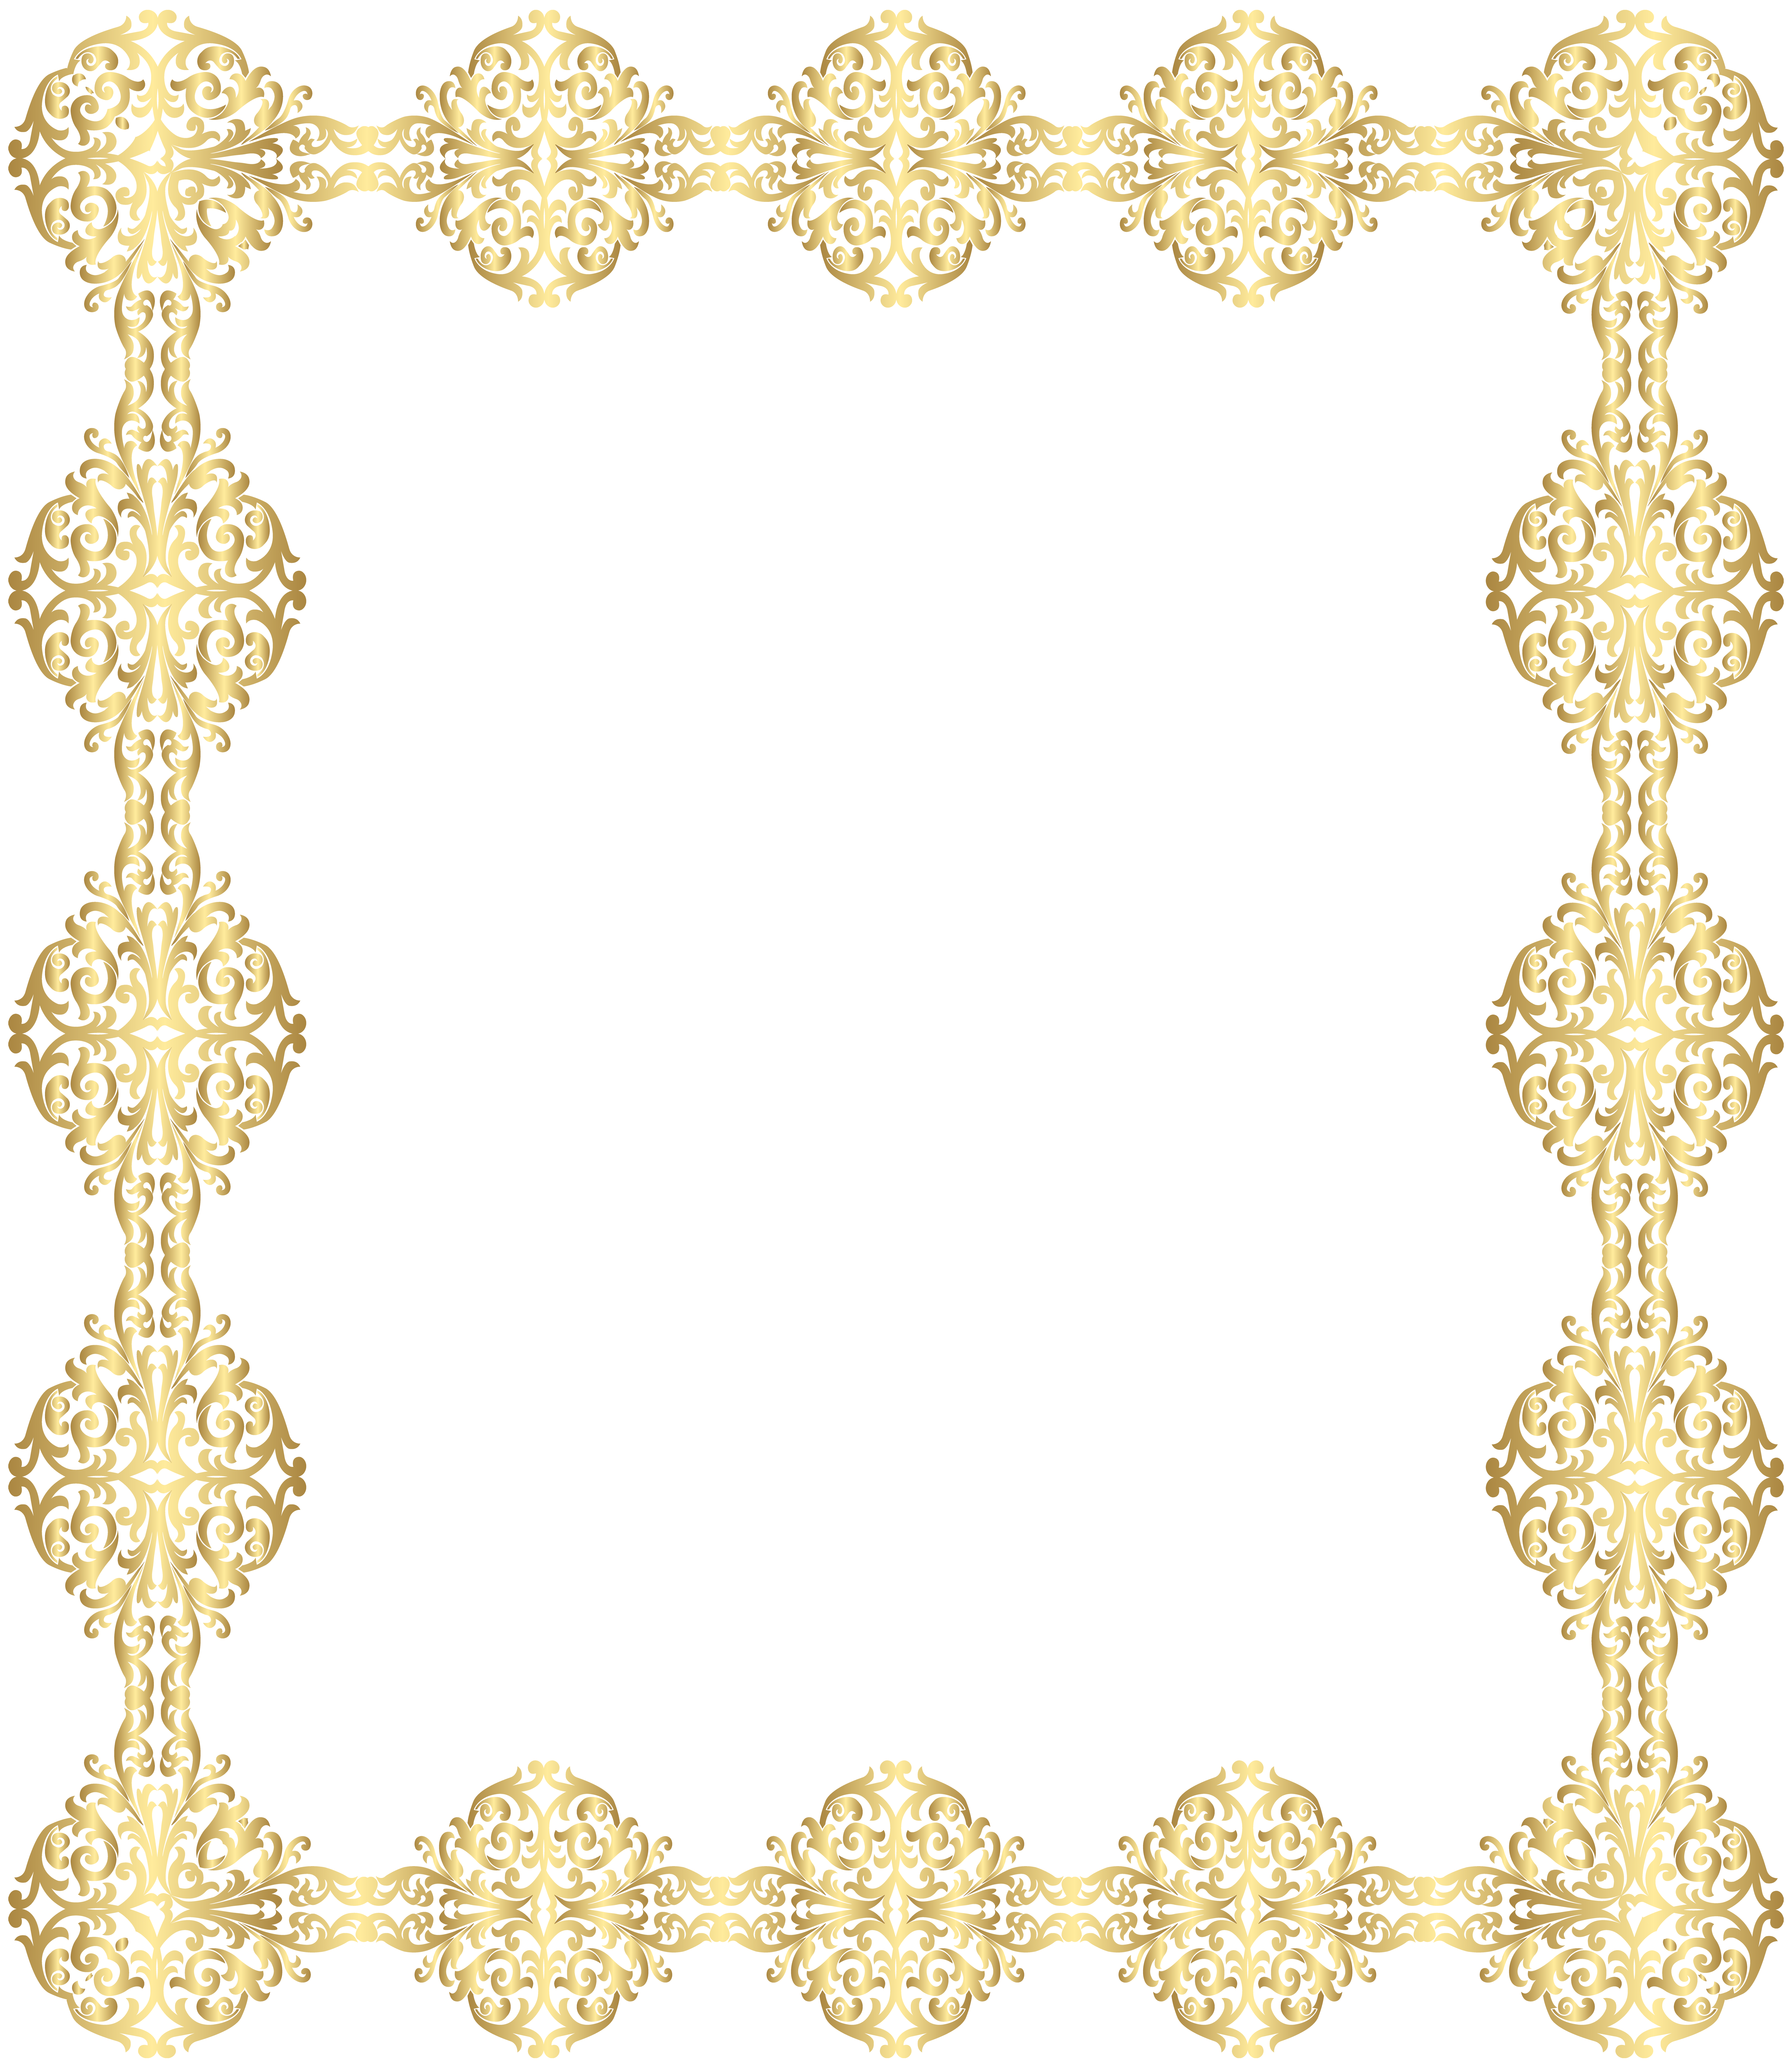 6933x8000 Golden Border Transparent Png Clip Artu200b Gallery Yopriceville